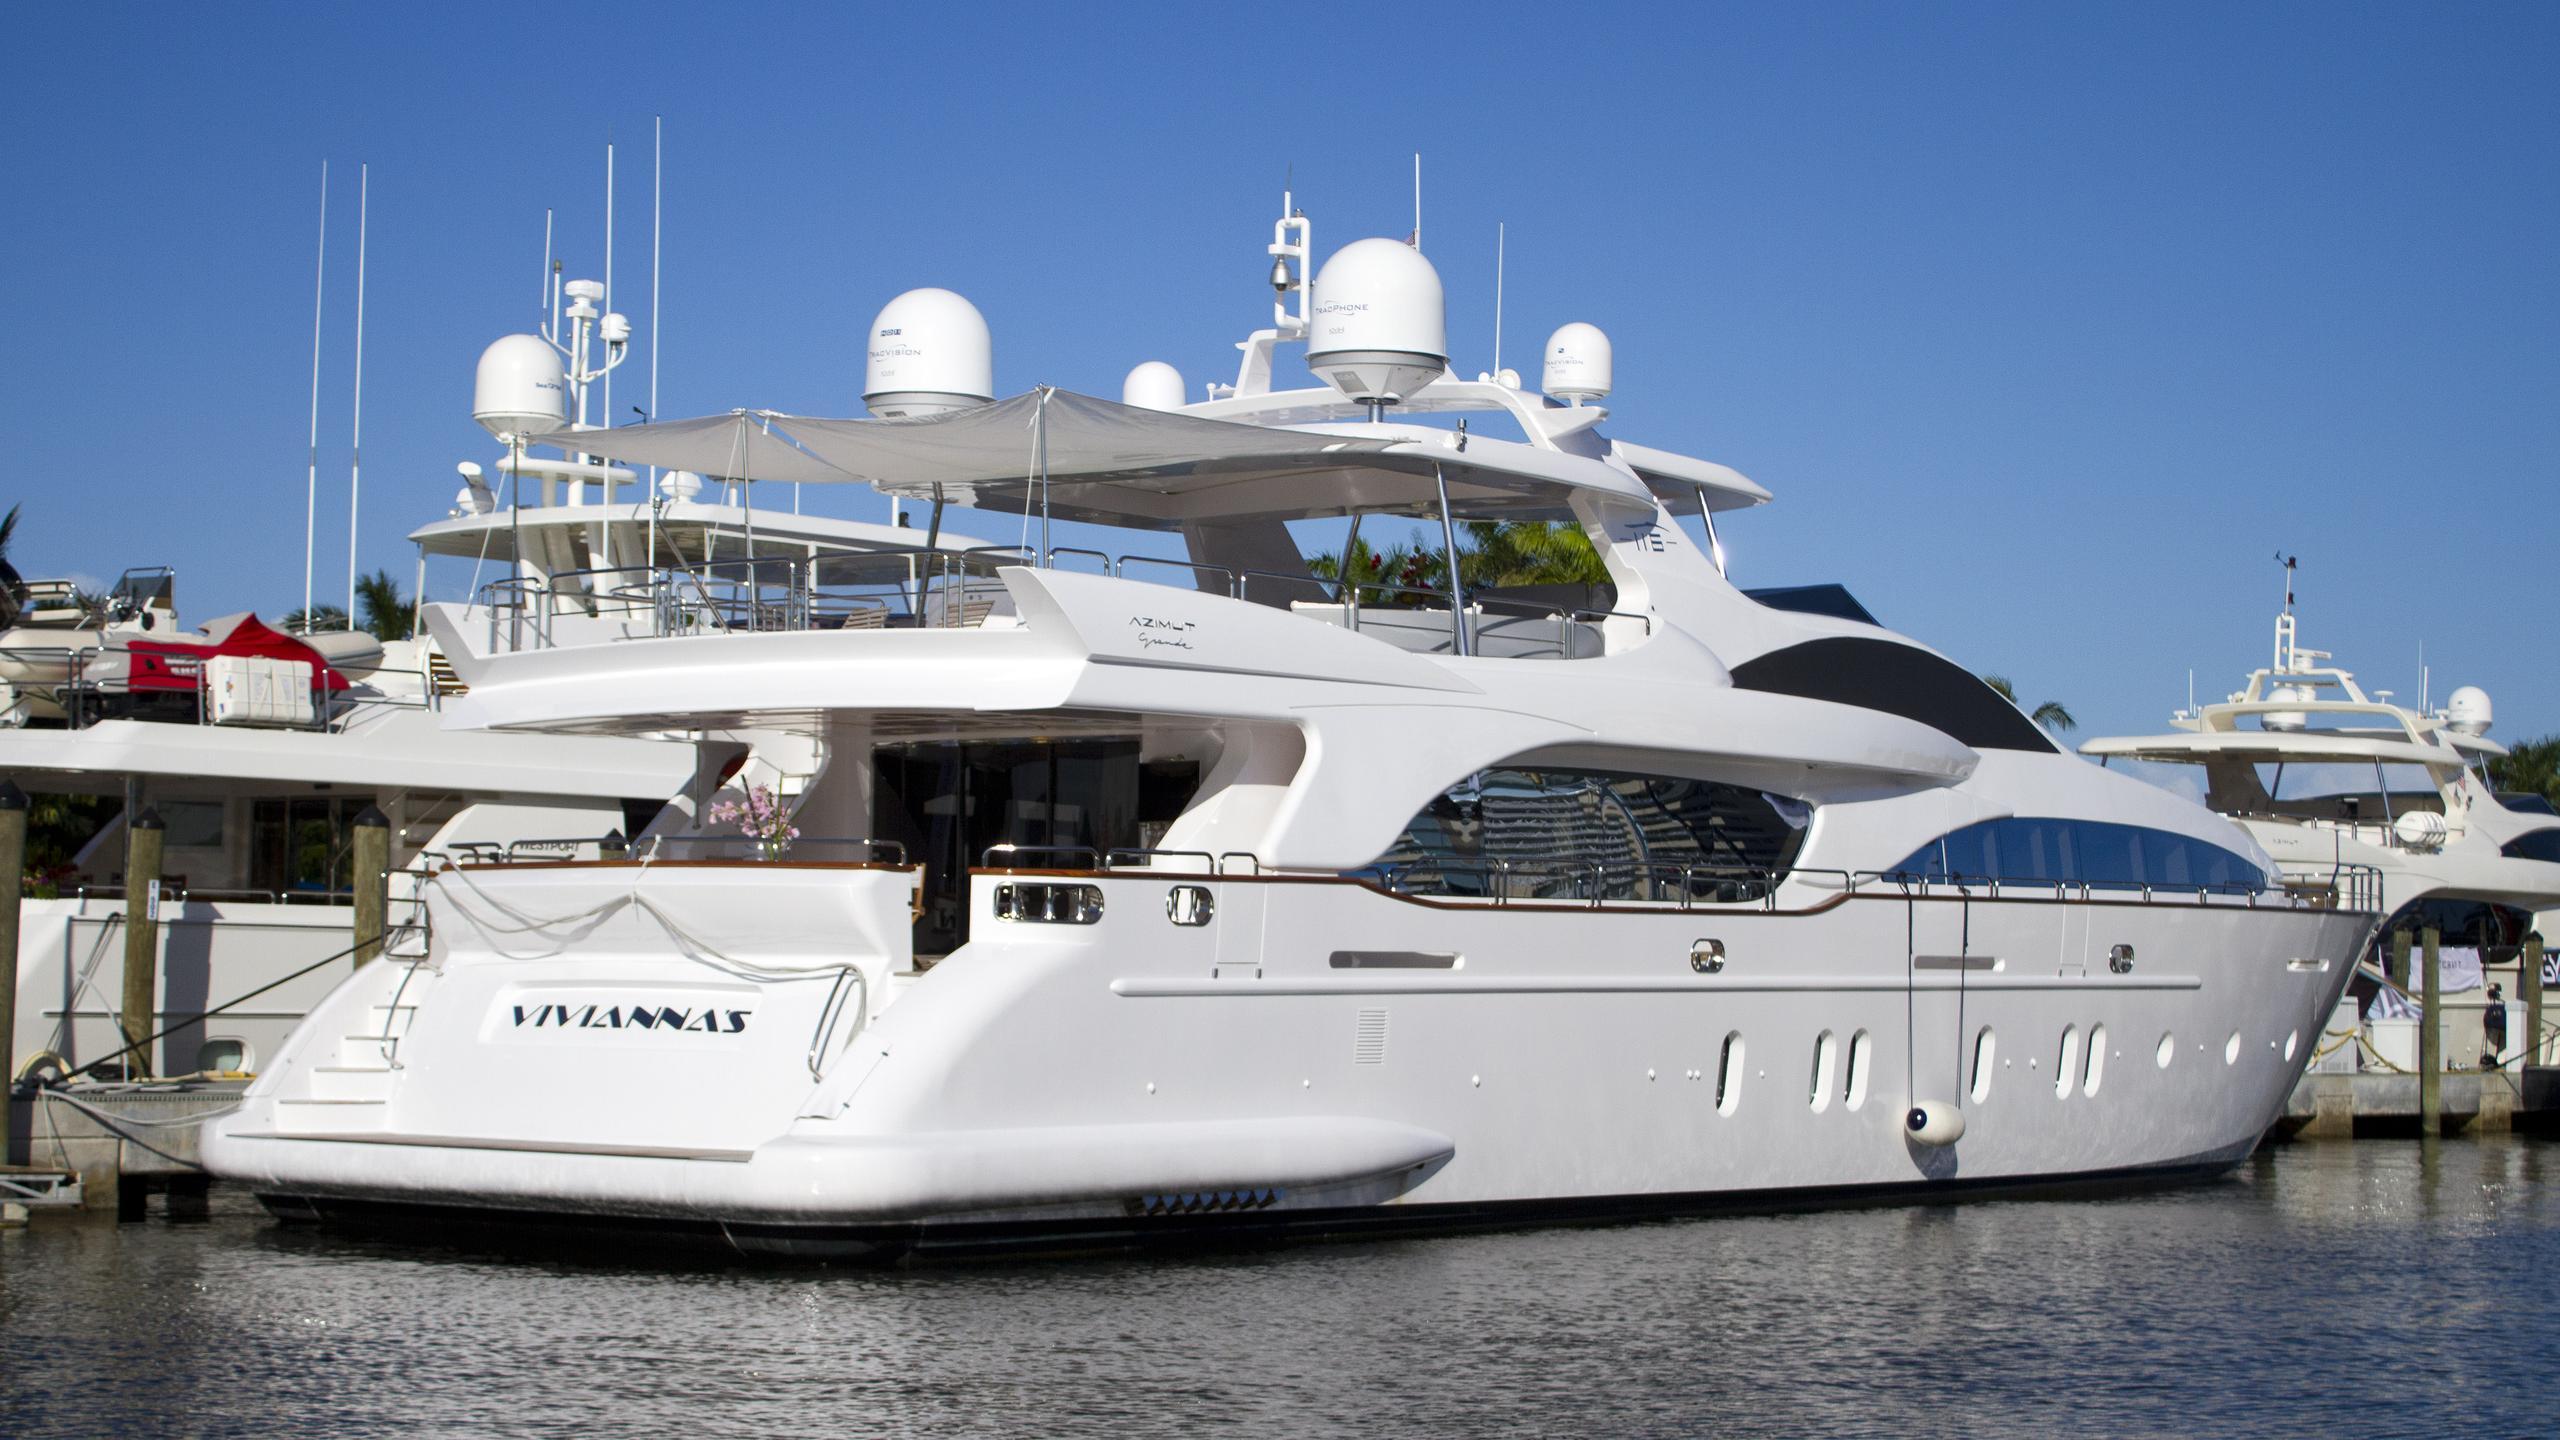 azimut-116-grande-viviannas-2013-35m-motor-yacht